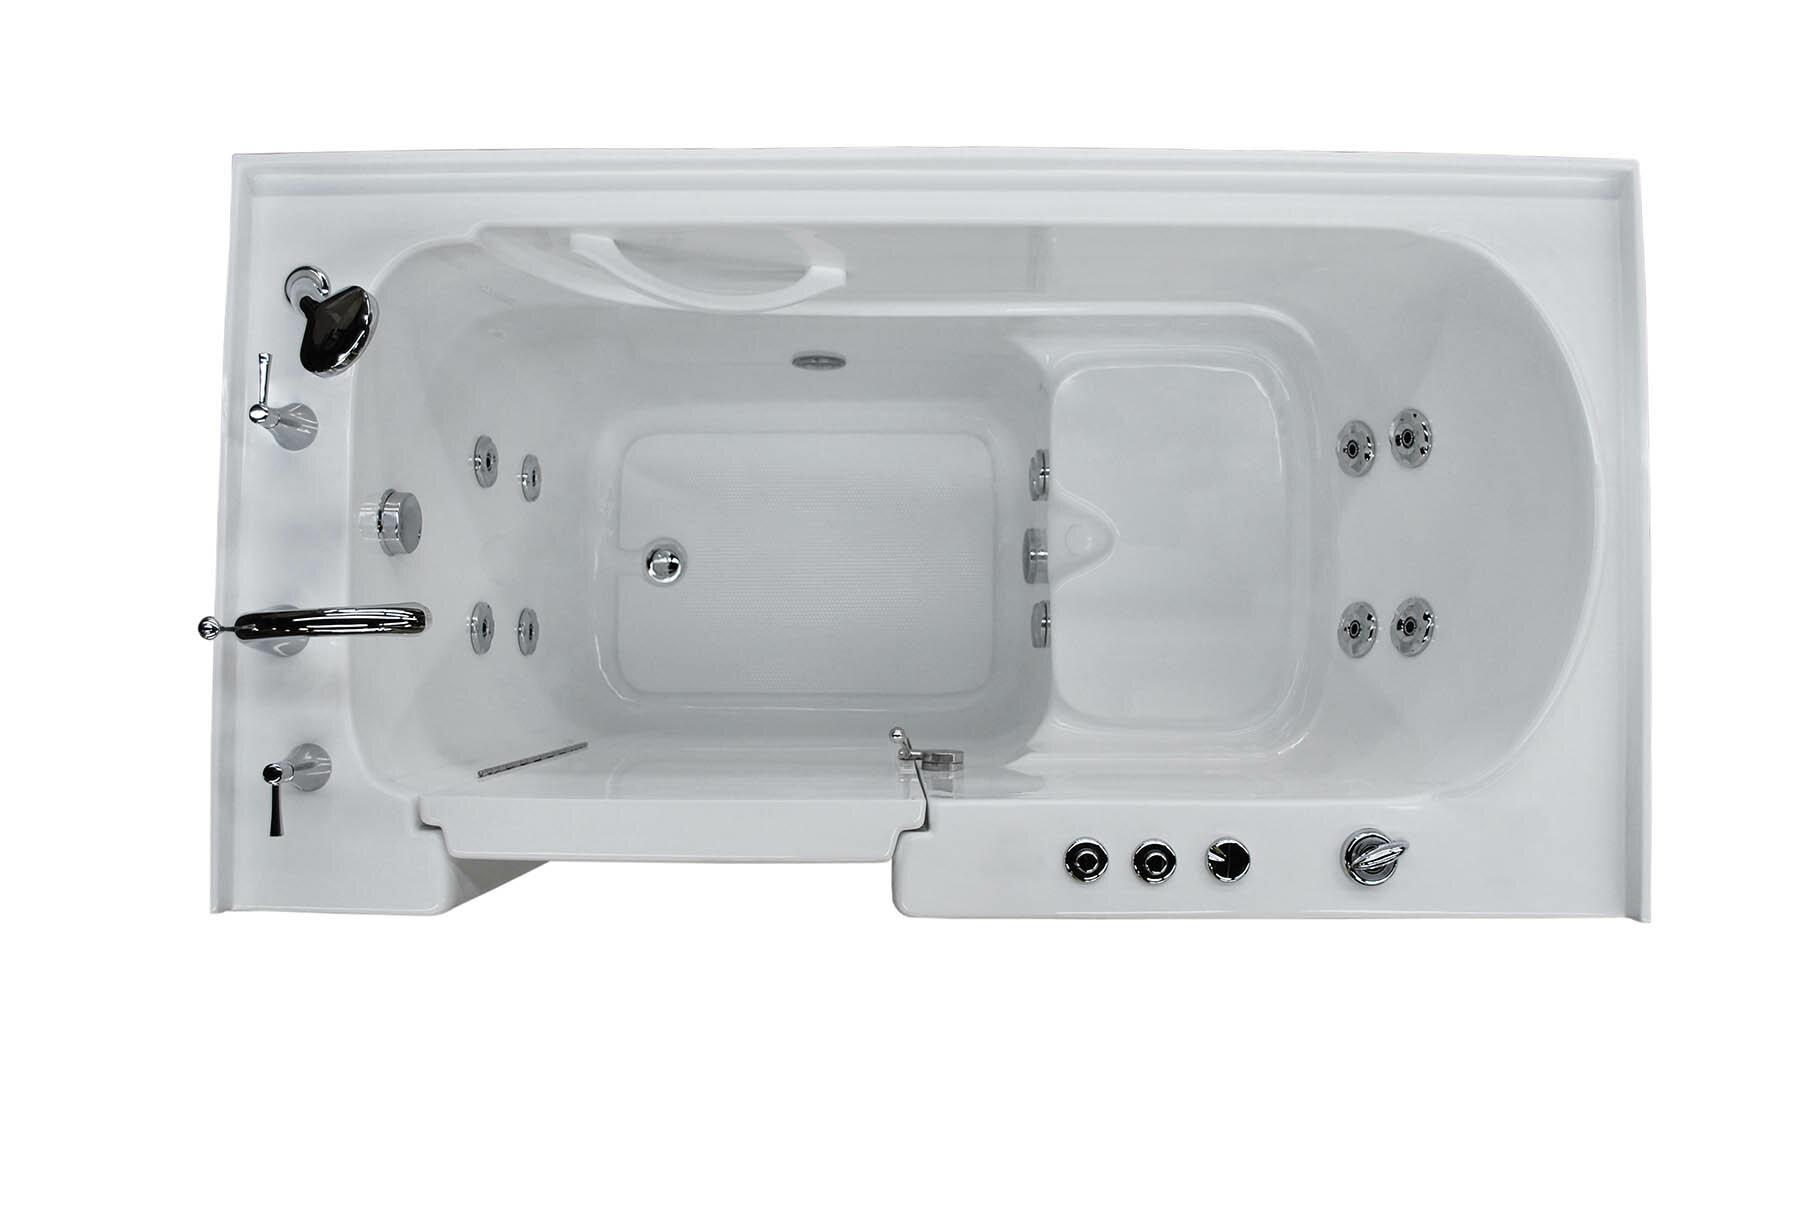 Therapeutic Tubs Aspen 60 X 32 Walk In Whirlpool Bathtub Wayfair